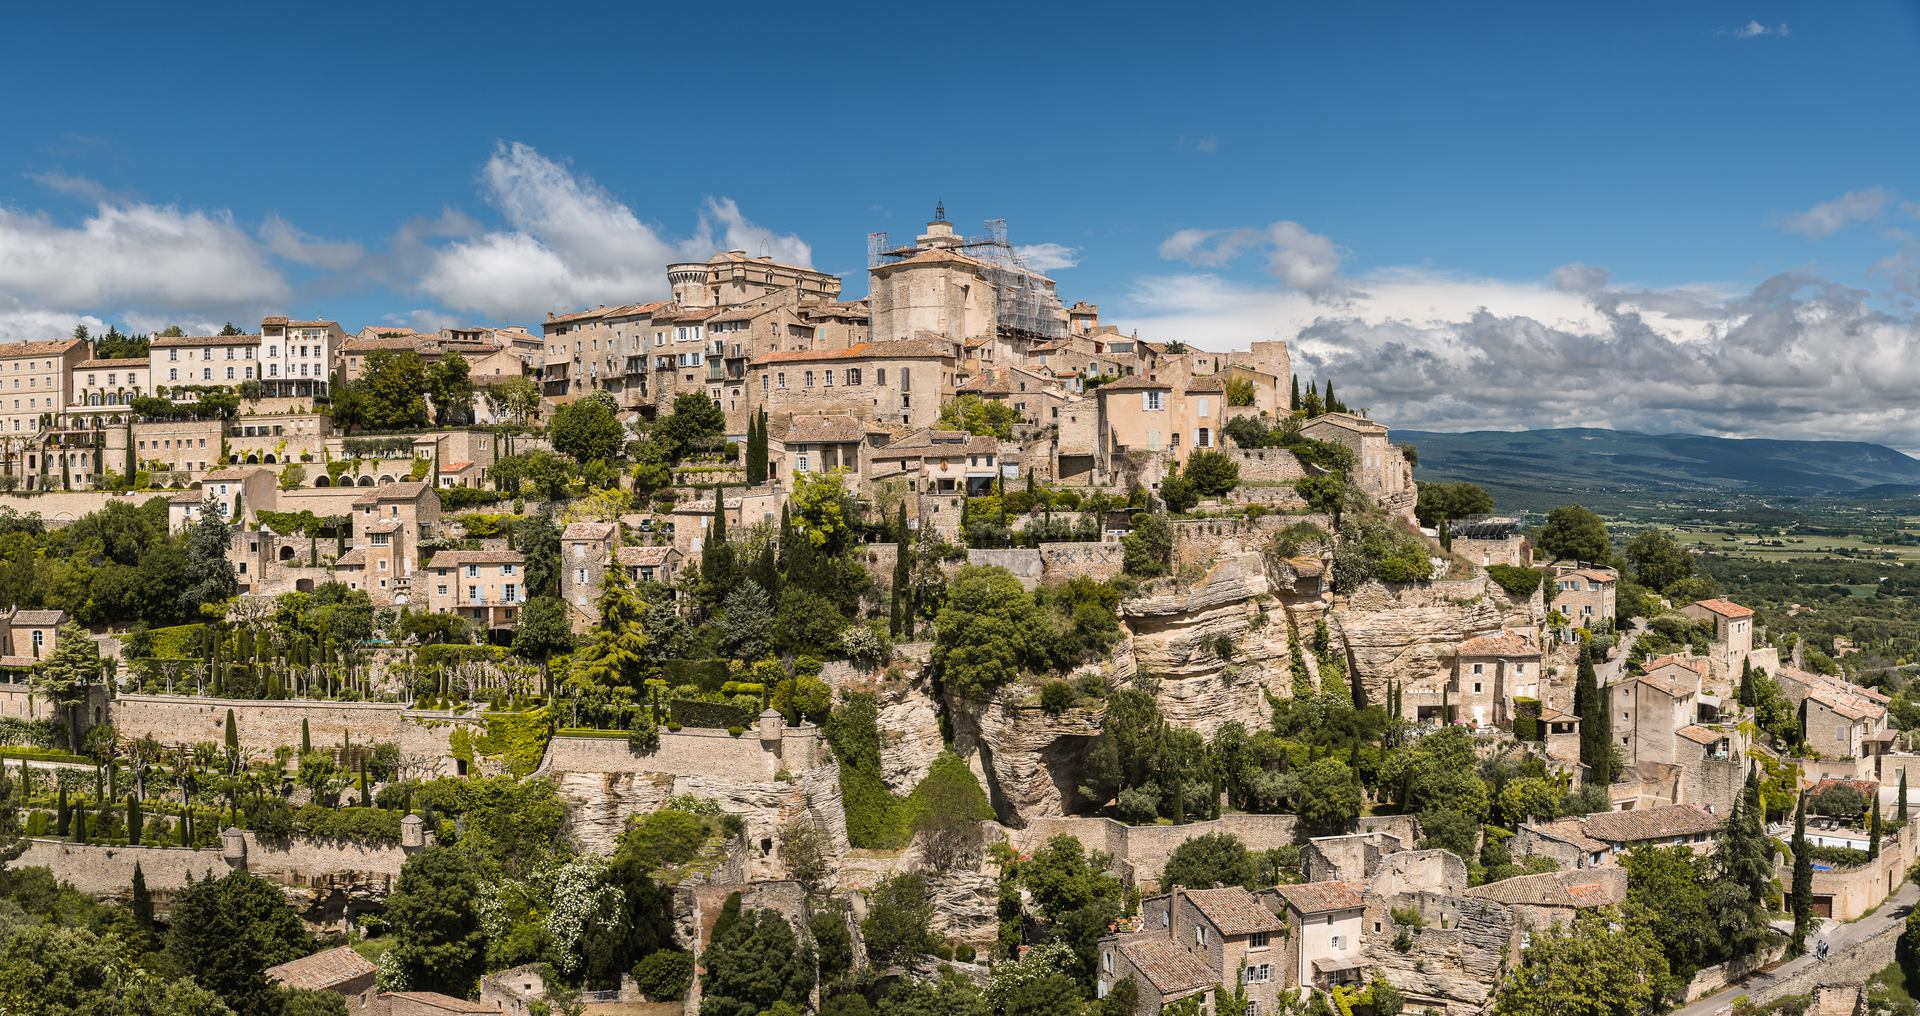 stories/2019-11-05-amazing-provence/gordes